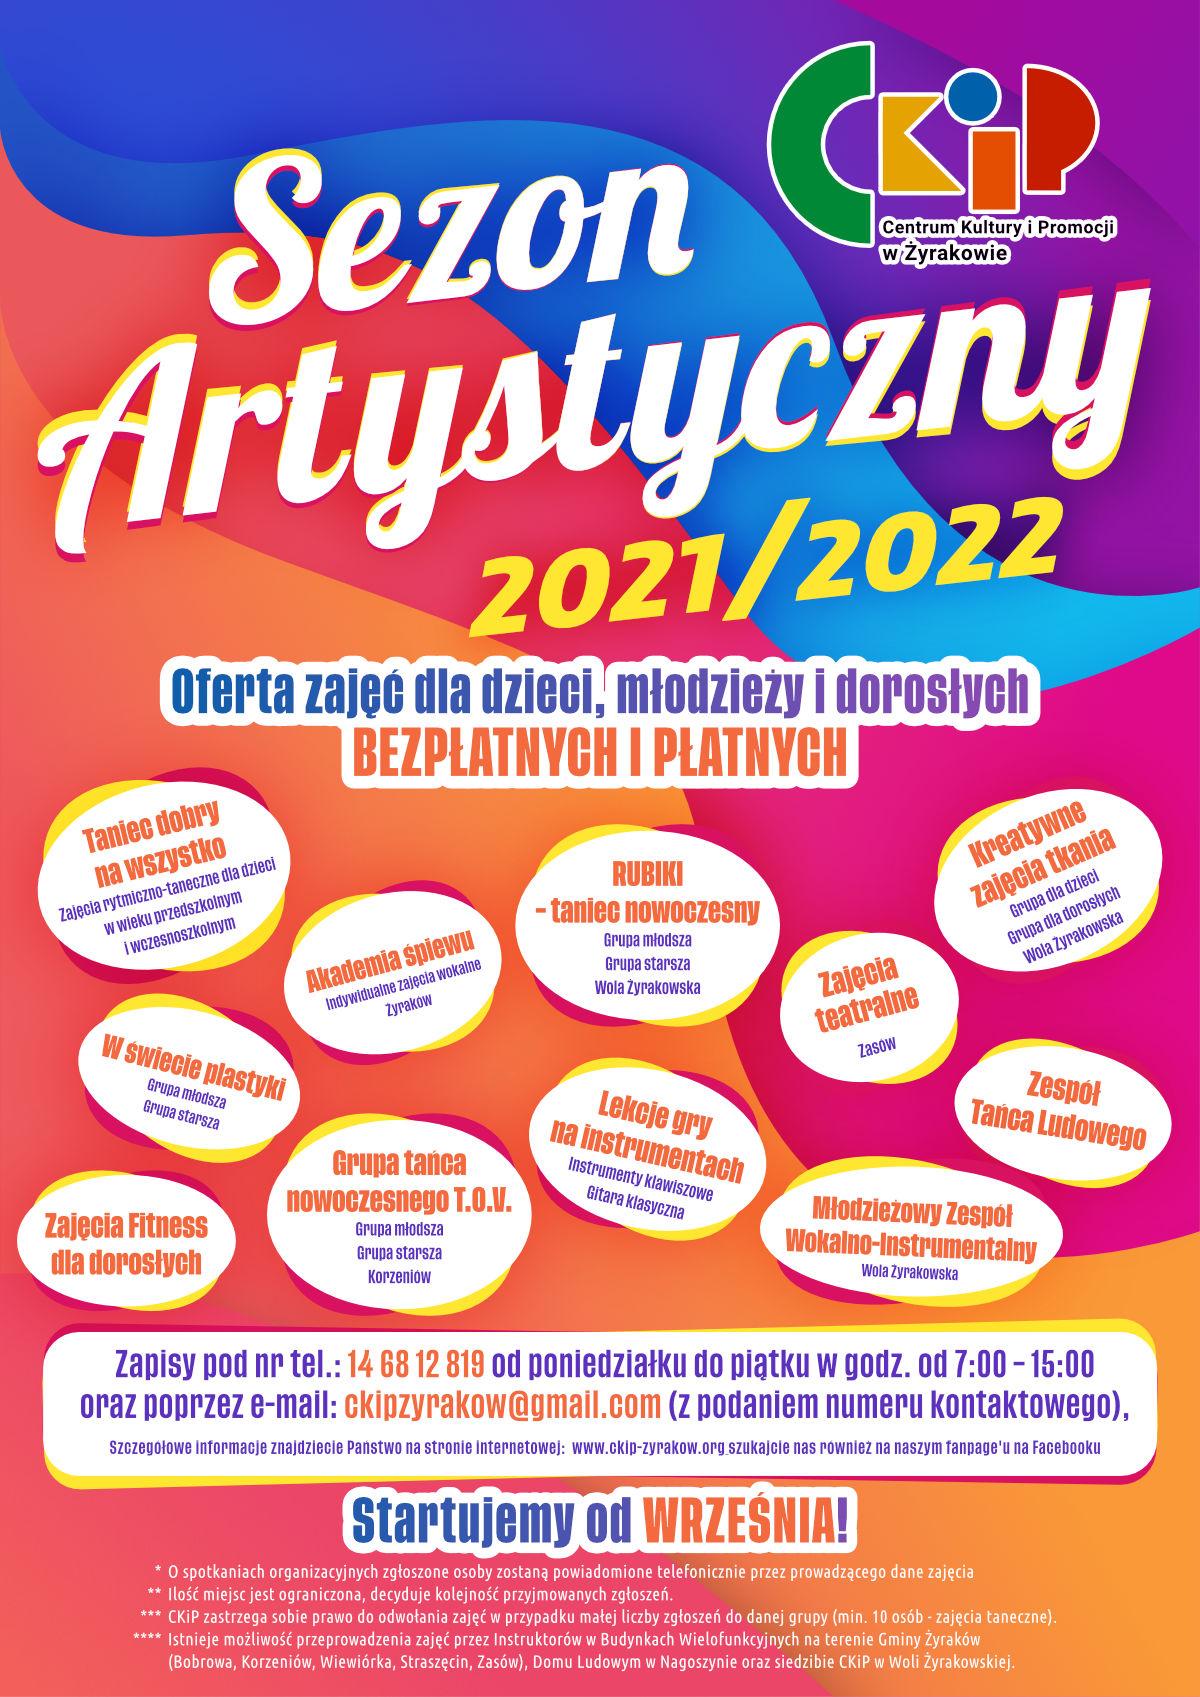 Sezon artystyczny 2021-2022